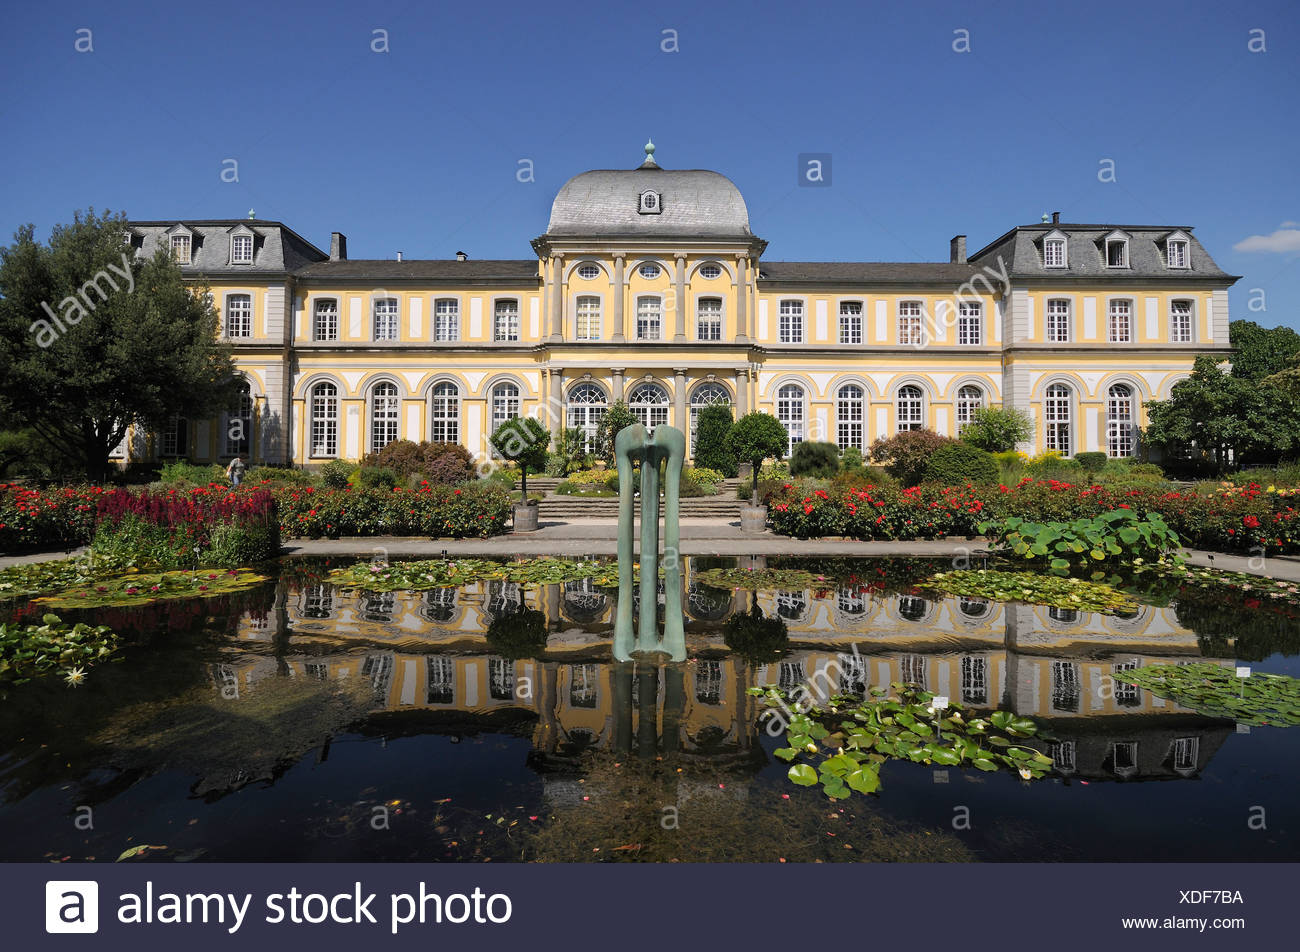 Giardino Botanico, Bonn Poppelsdorf di Bonn, Renania settentrionale-Vestfalia Immagini Stock